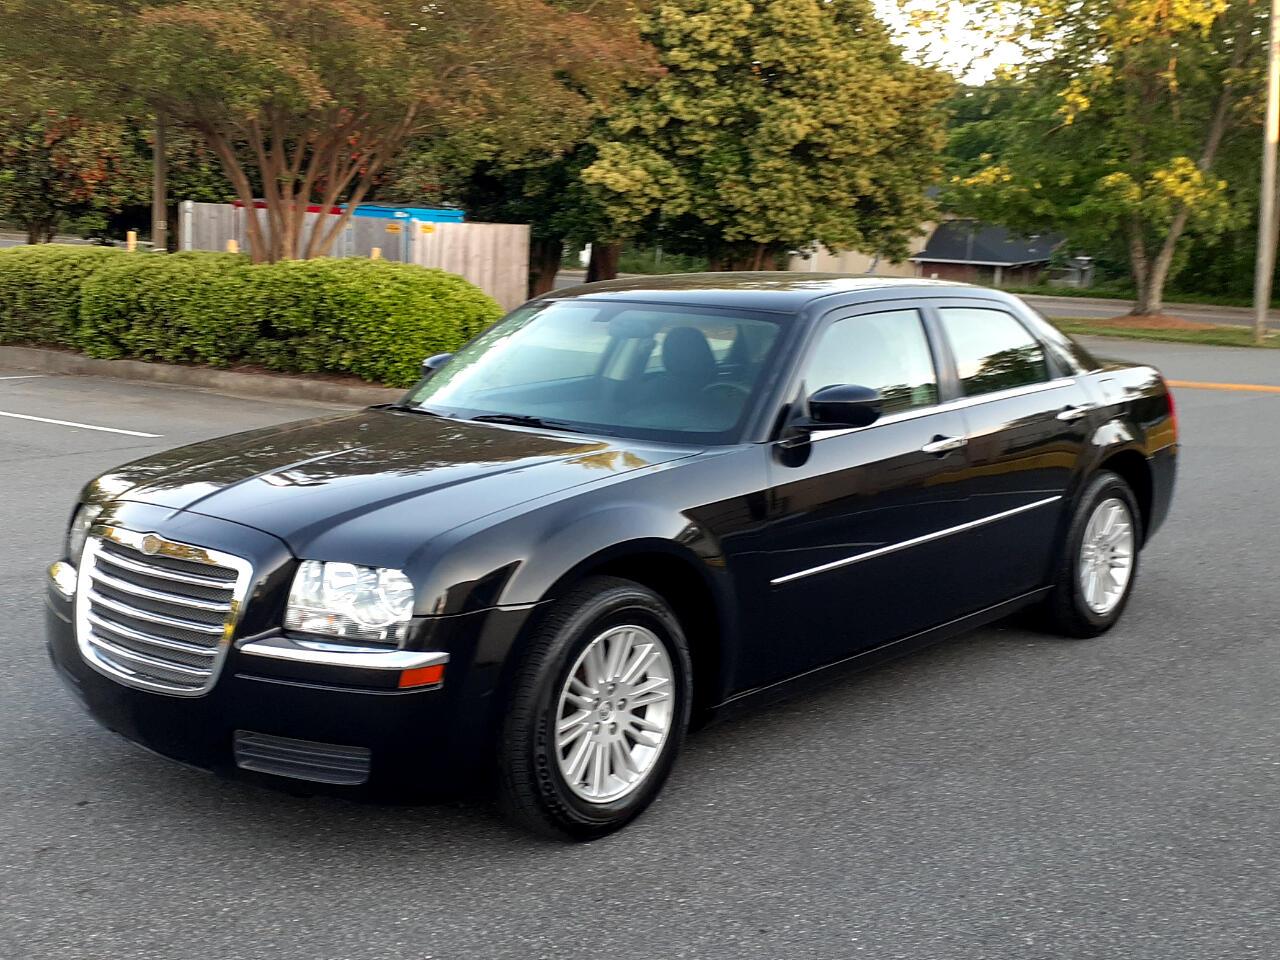 Chrysler 300 4dr Sdn 300 LX RWD 2008